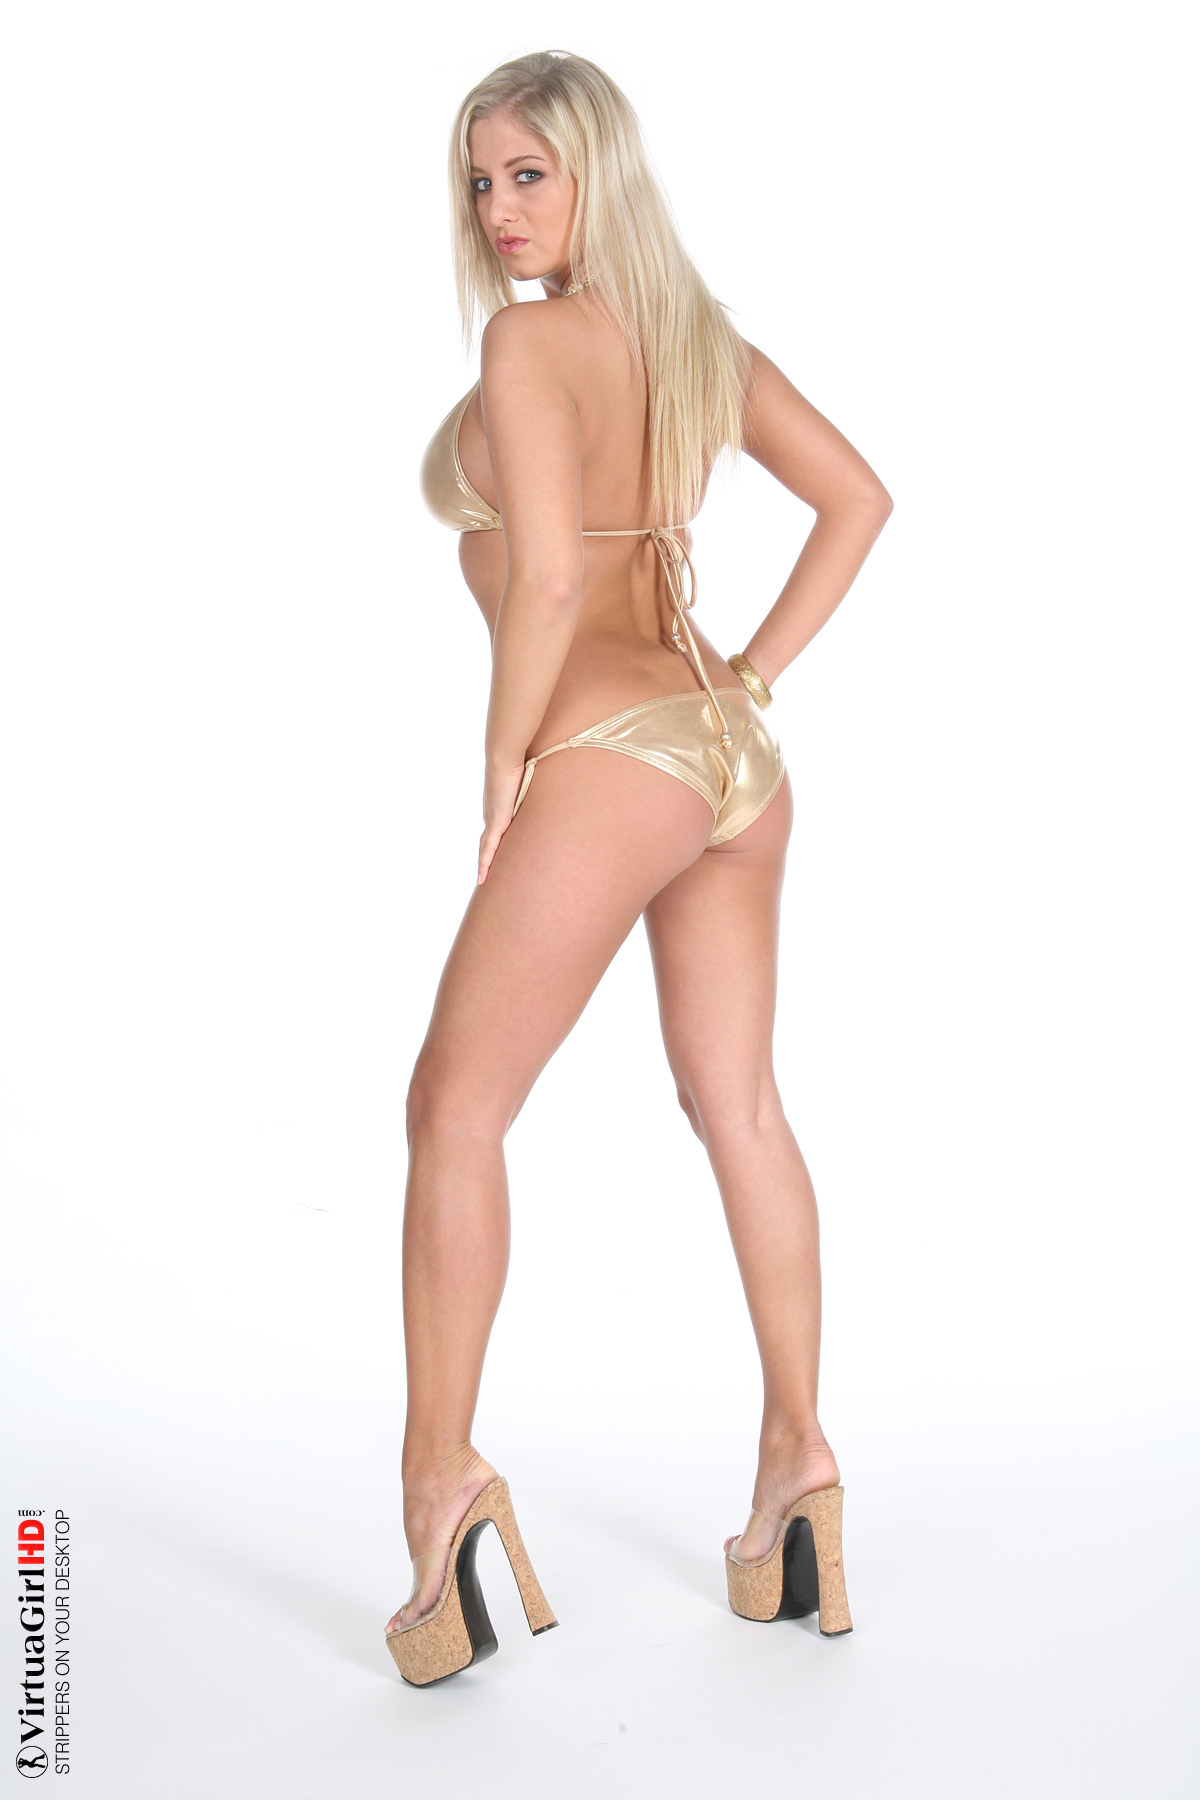 full hd nude girls wallpapers